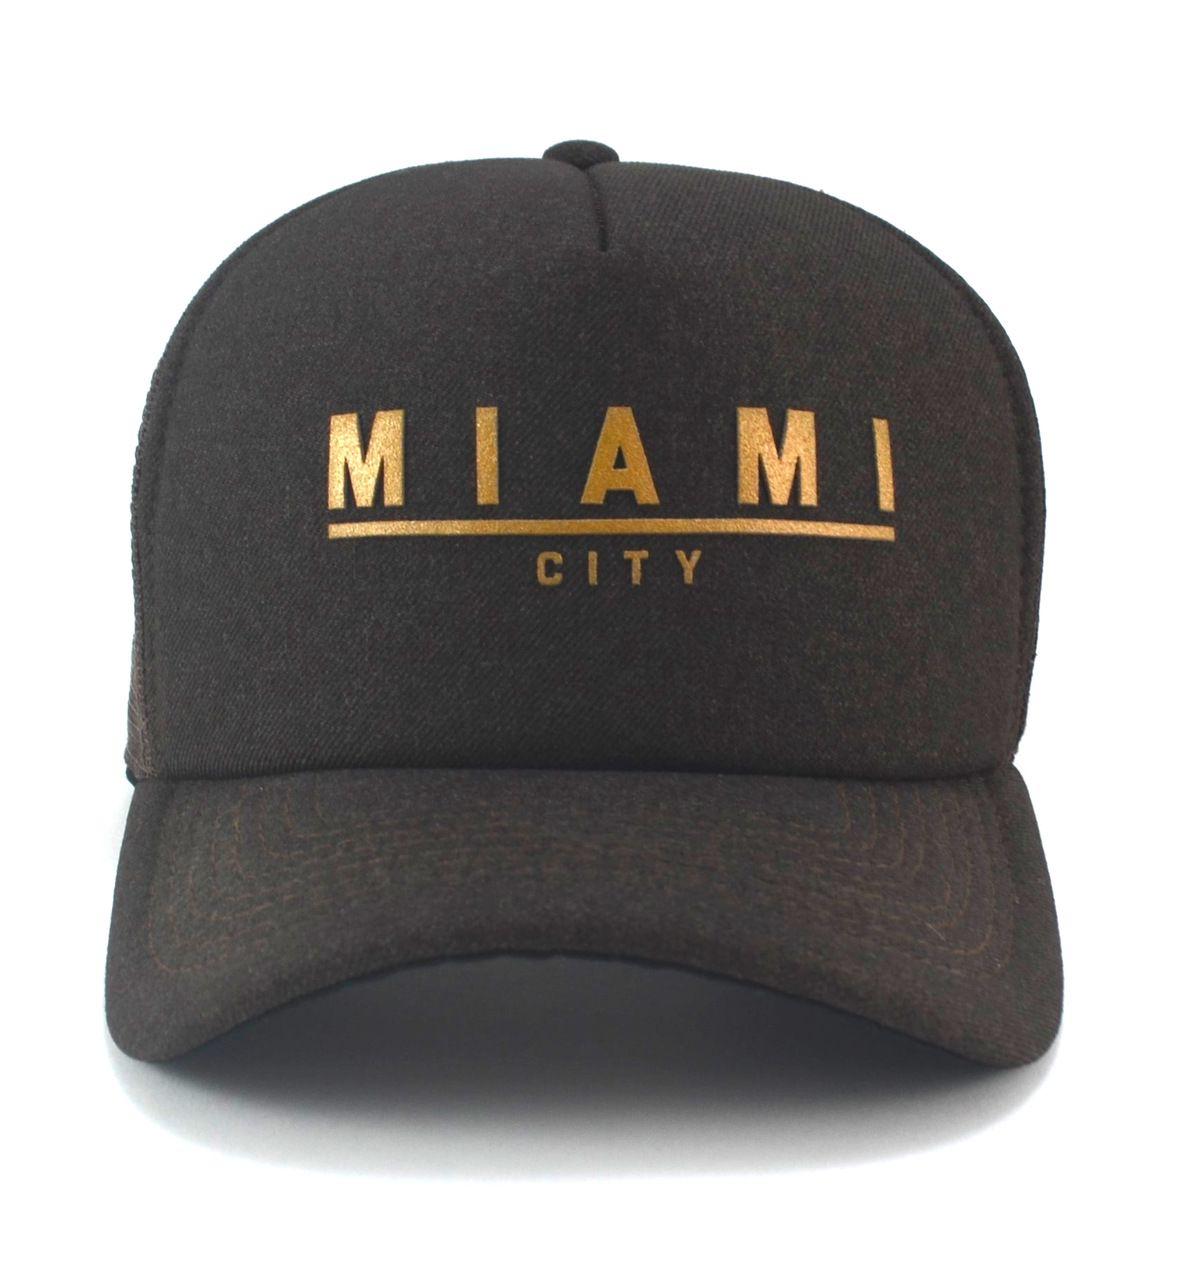 Boné Miami City Aba Curva Sugar Brown Unisex